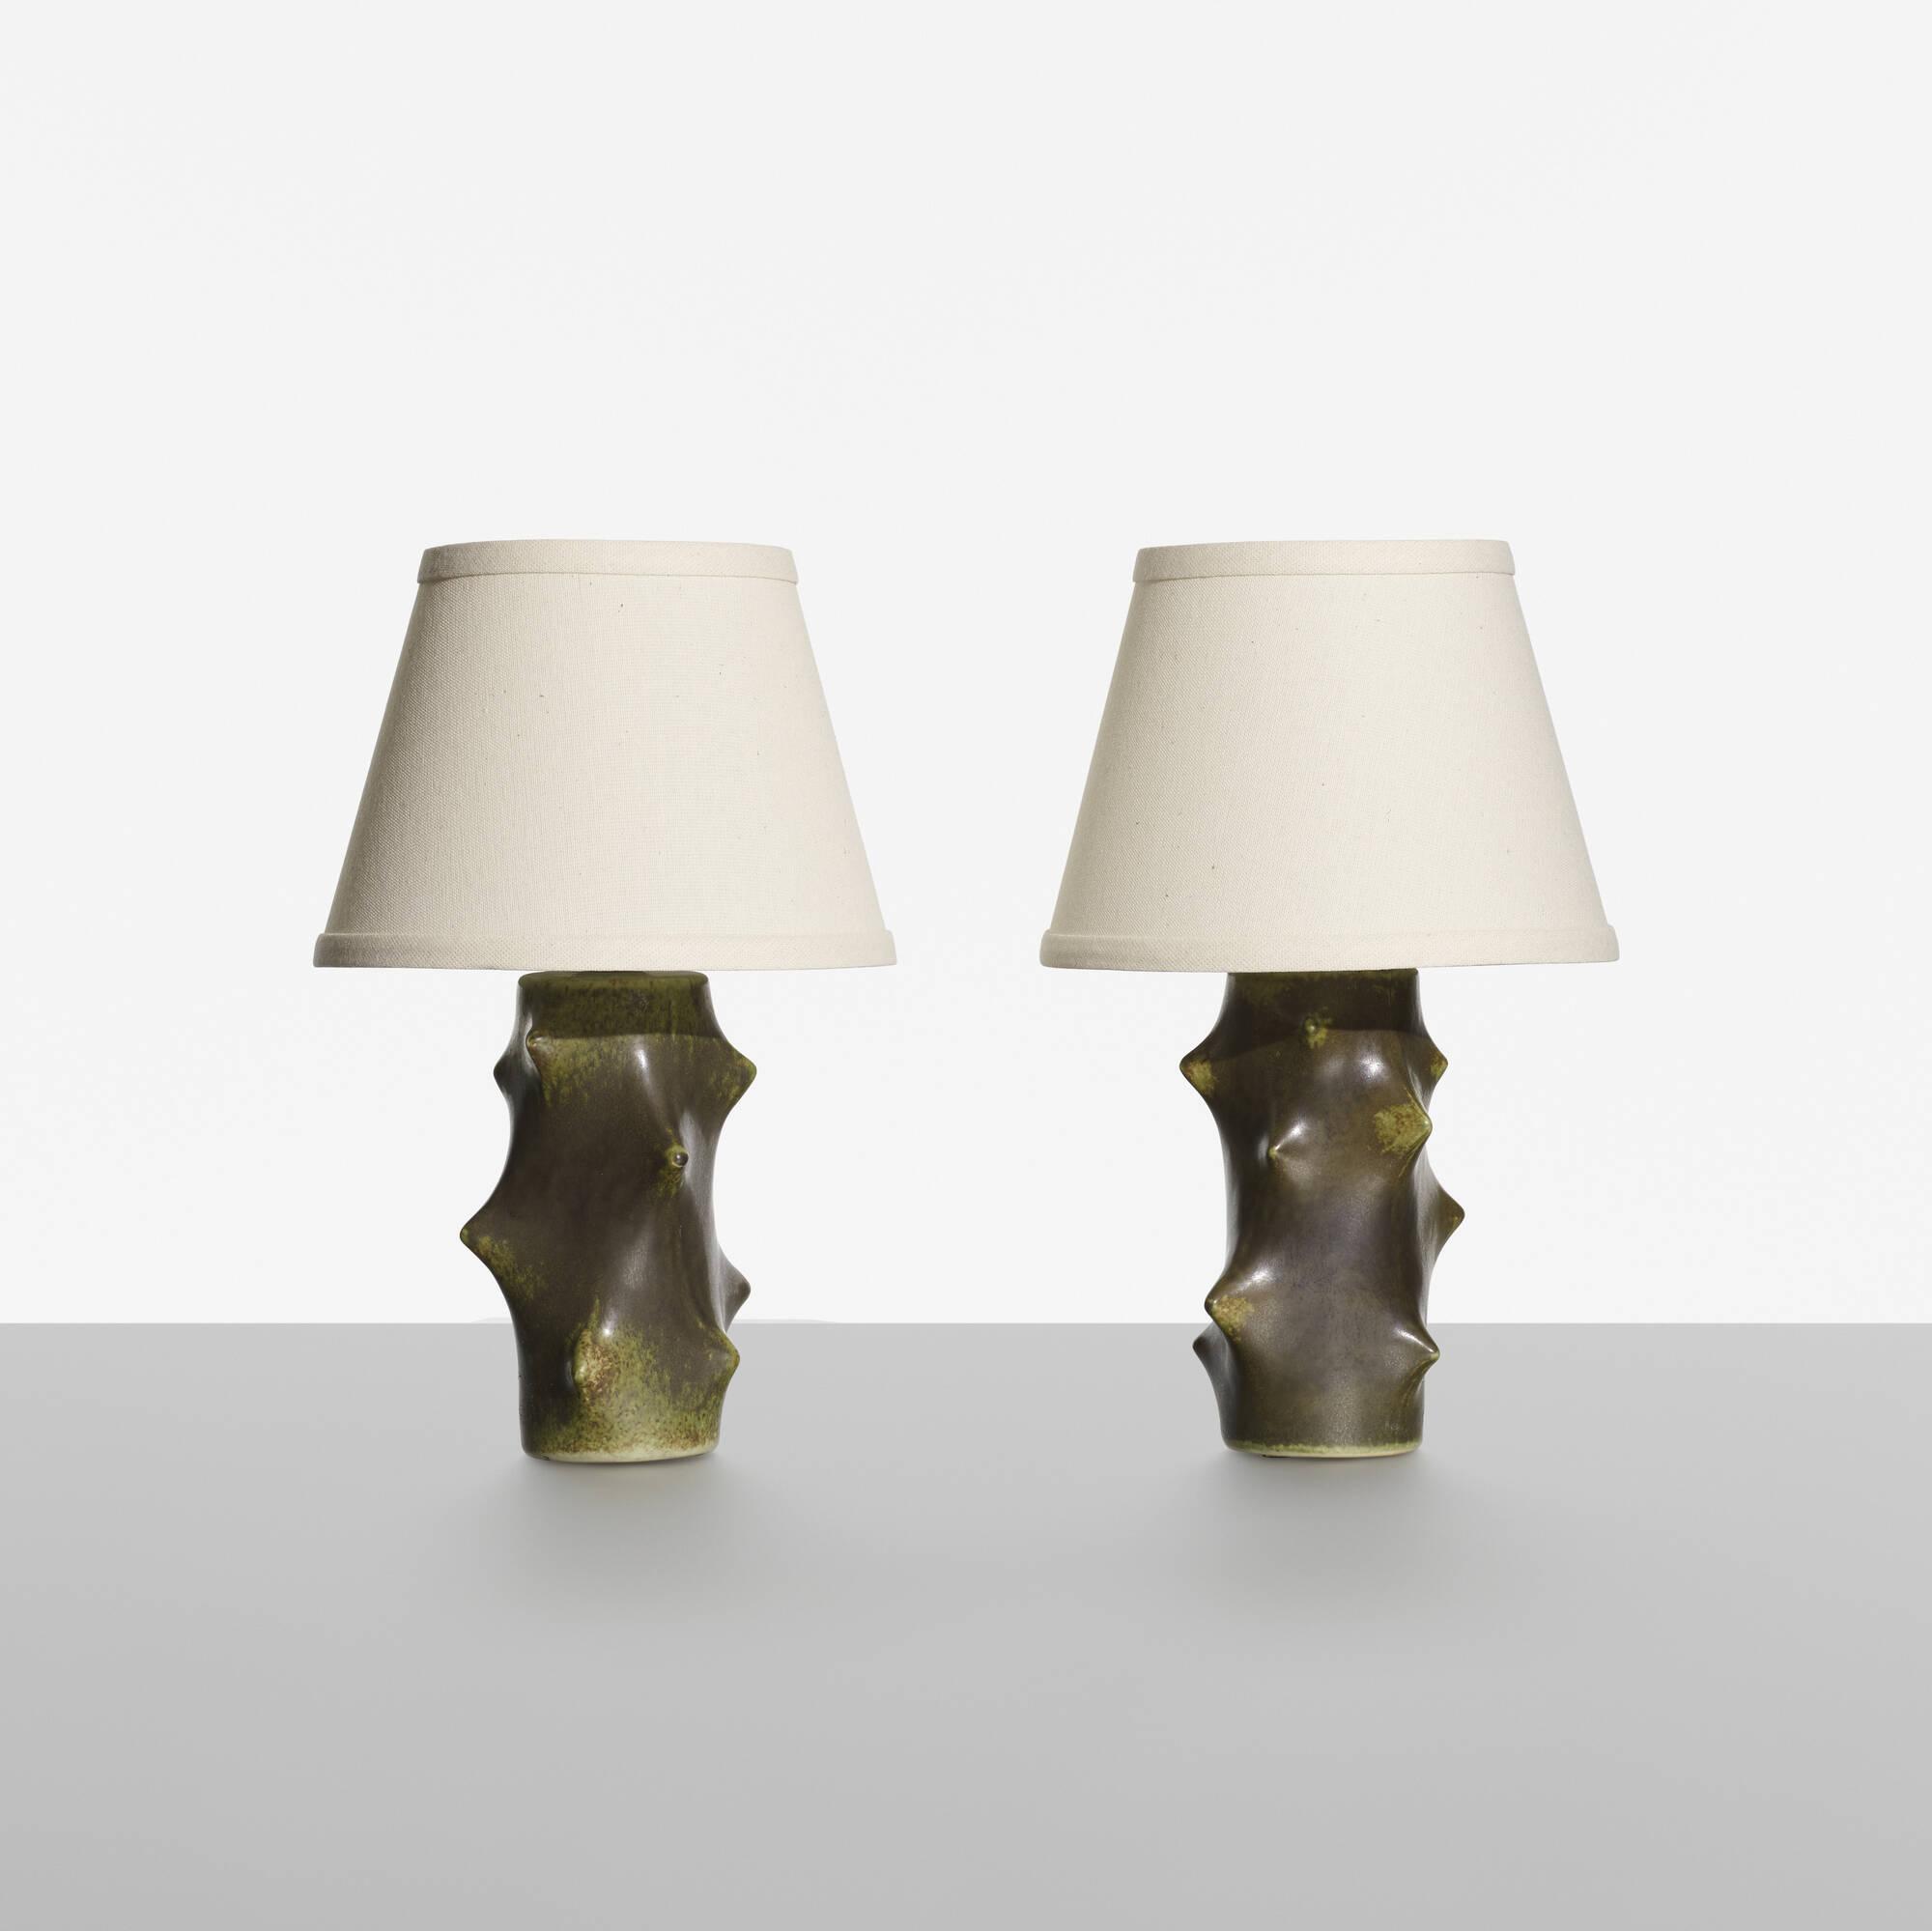 206: Knud Basse / table lamps, pair (1 of 2)